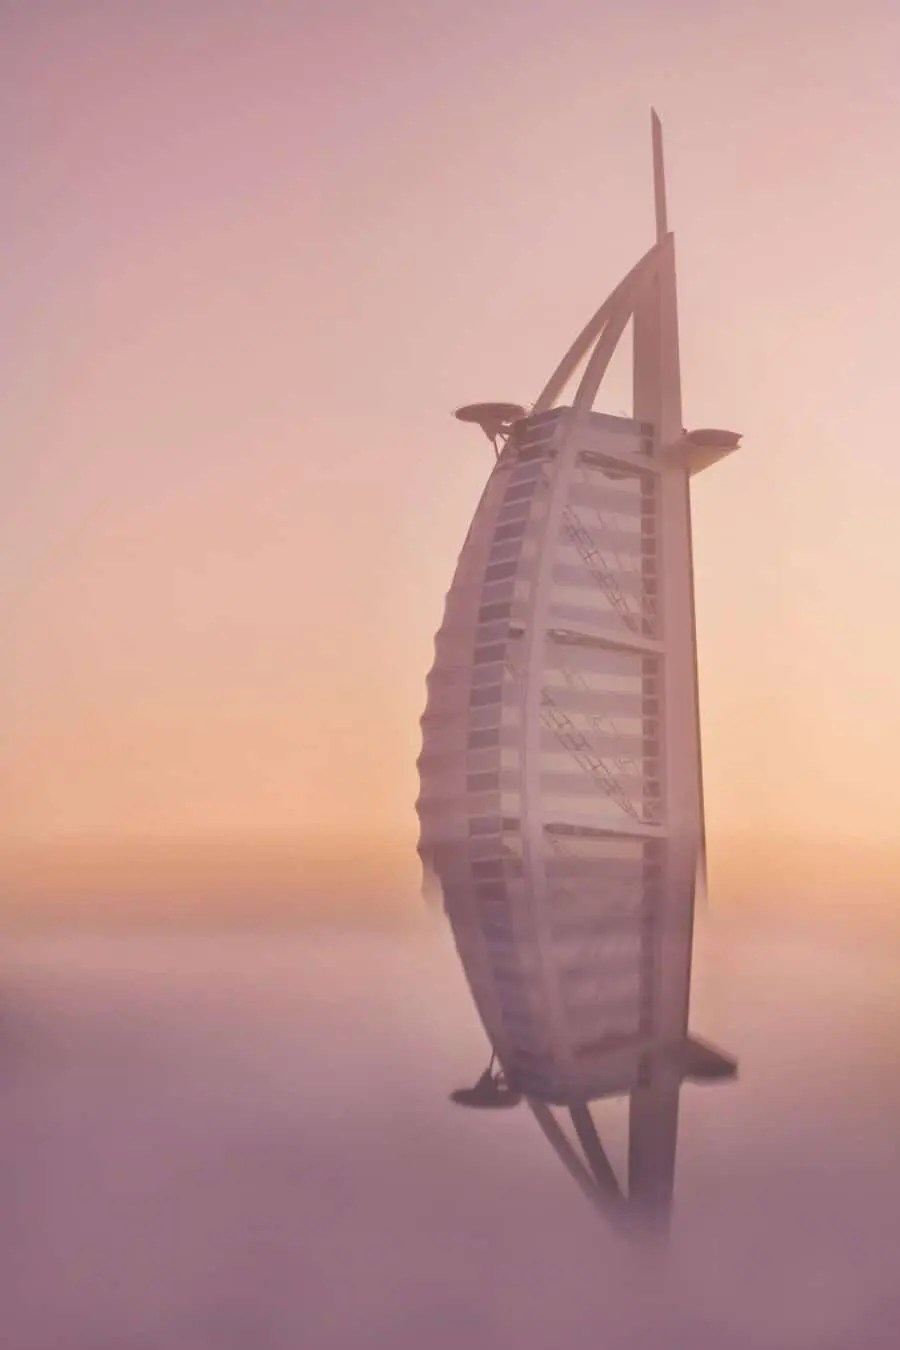 Creating Reflections - Burj al Arab, Dubai